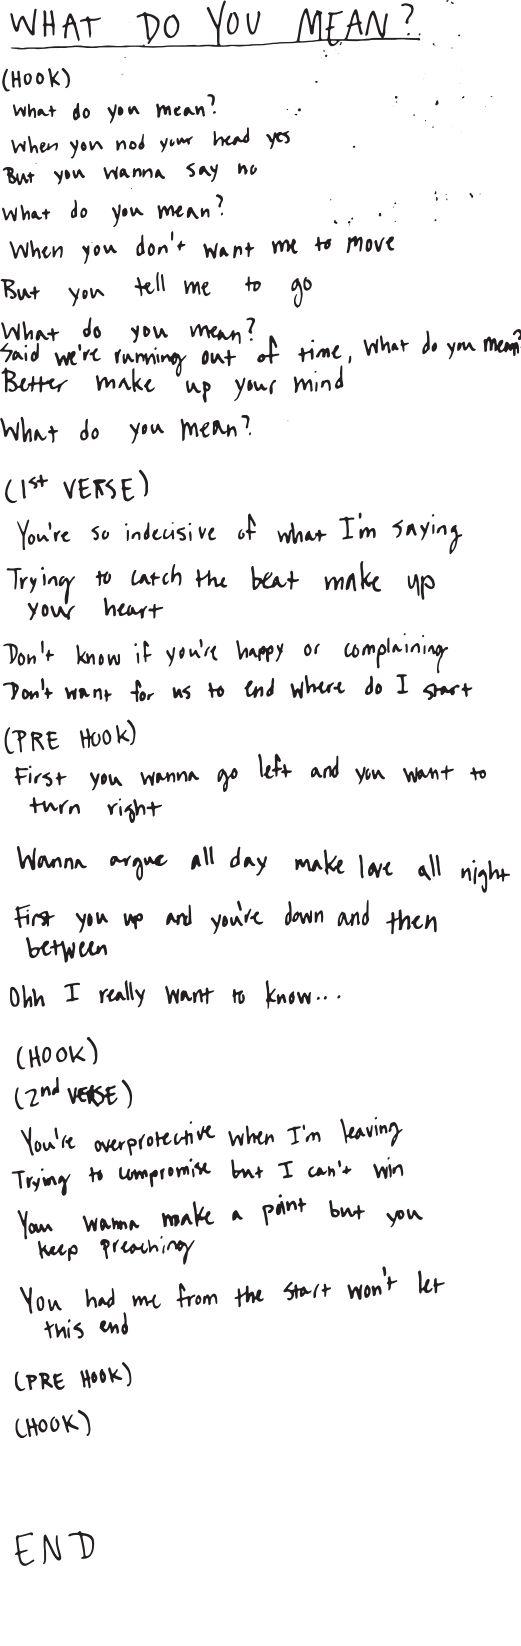 Justin bieber tumblr lyrics live quotes - Good Work Here S The Whatdoyoumean Lyrics U Found Http Justinbiebermusic Justin Bieber